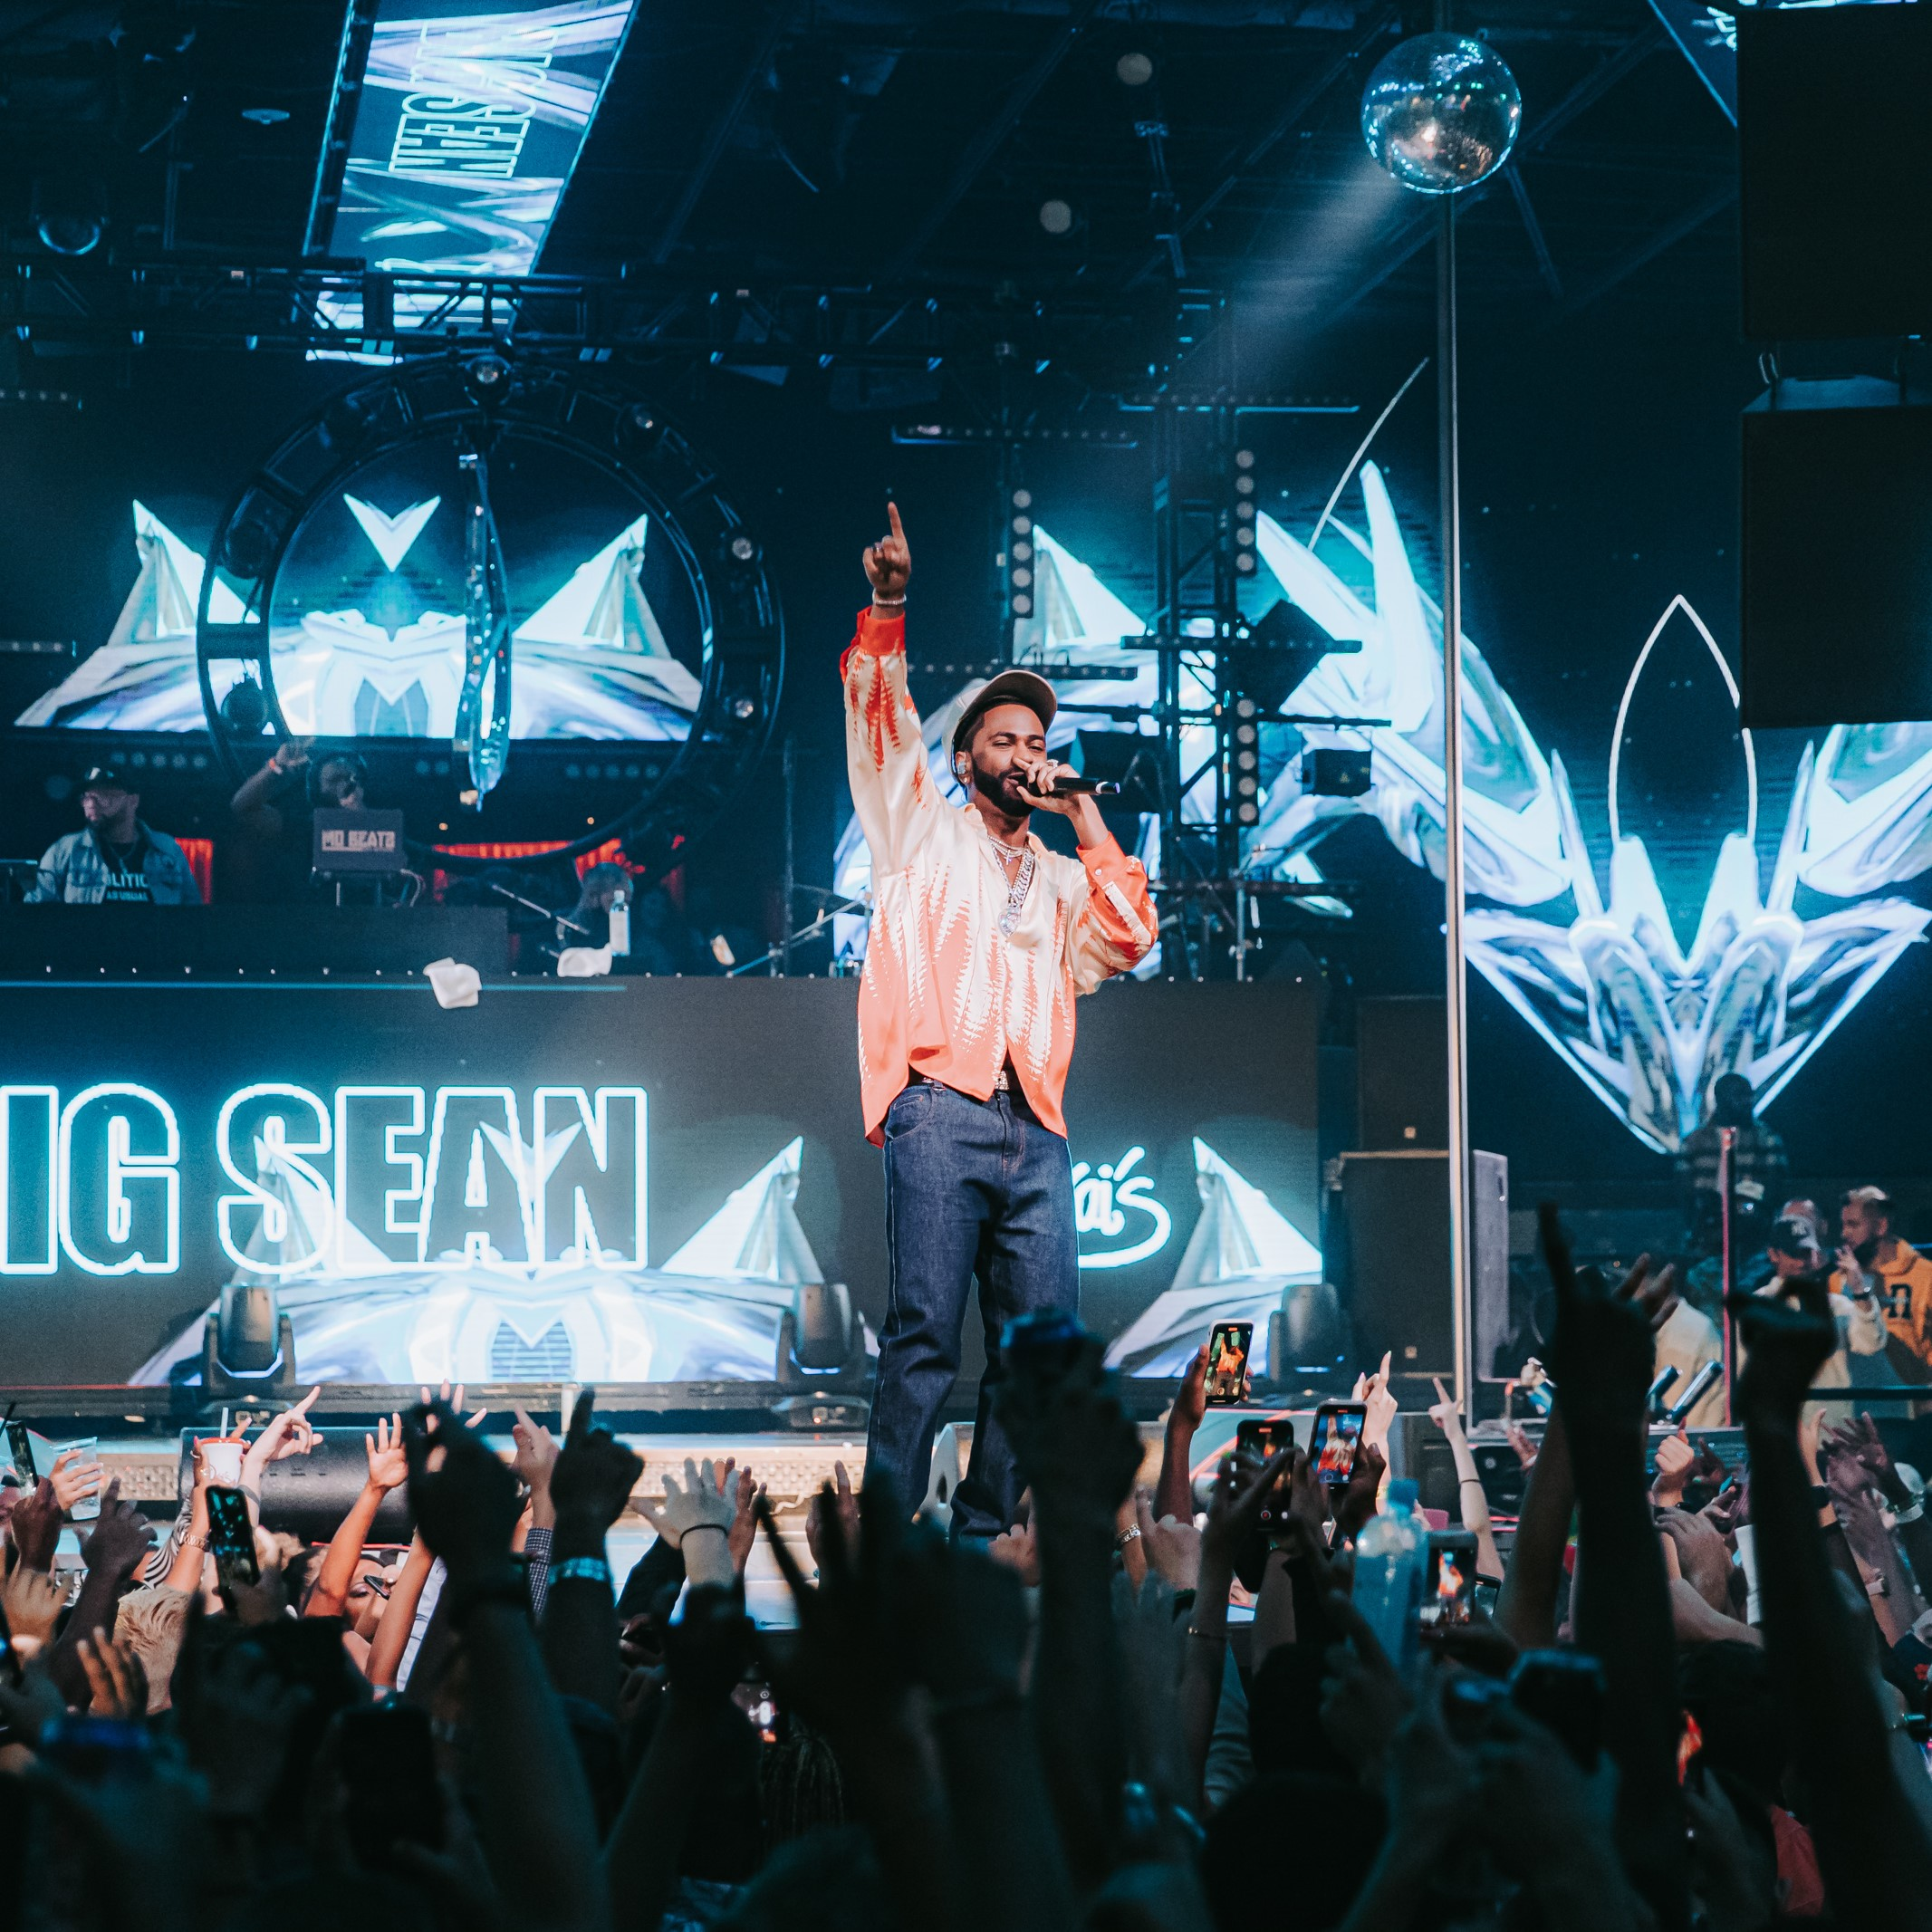 Big Sean at Drai's via Creative Collective for use by 360 Magazine